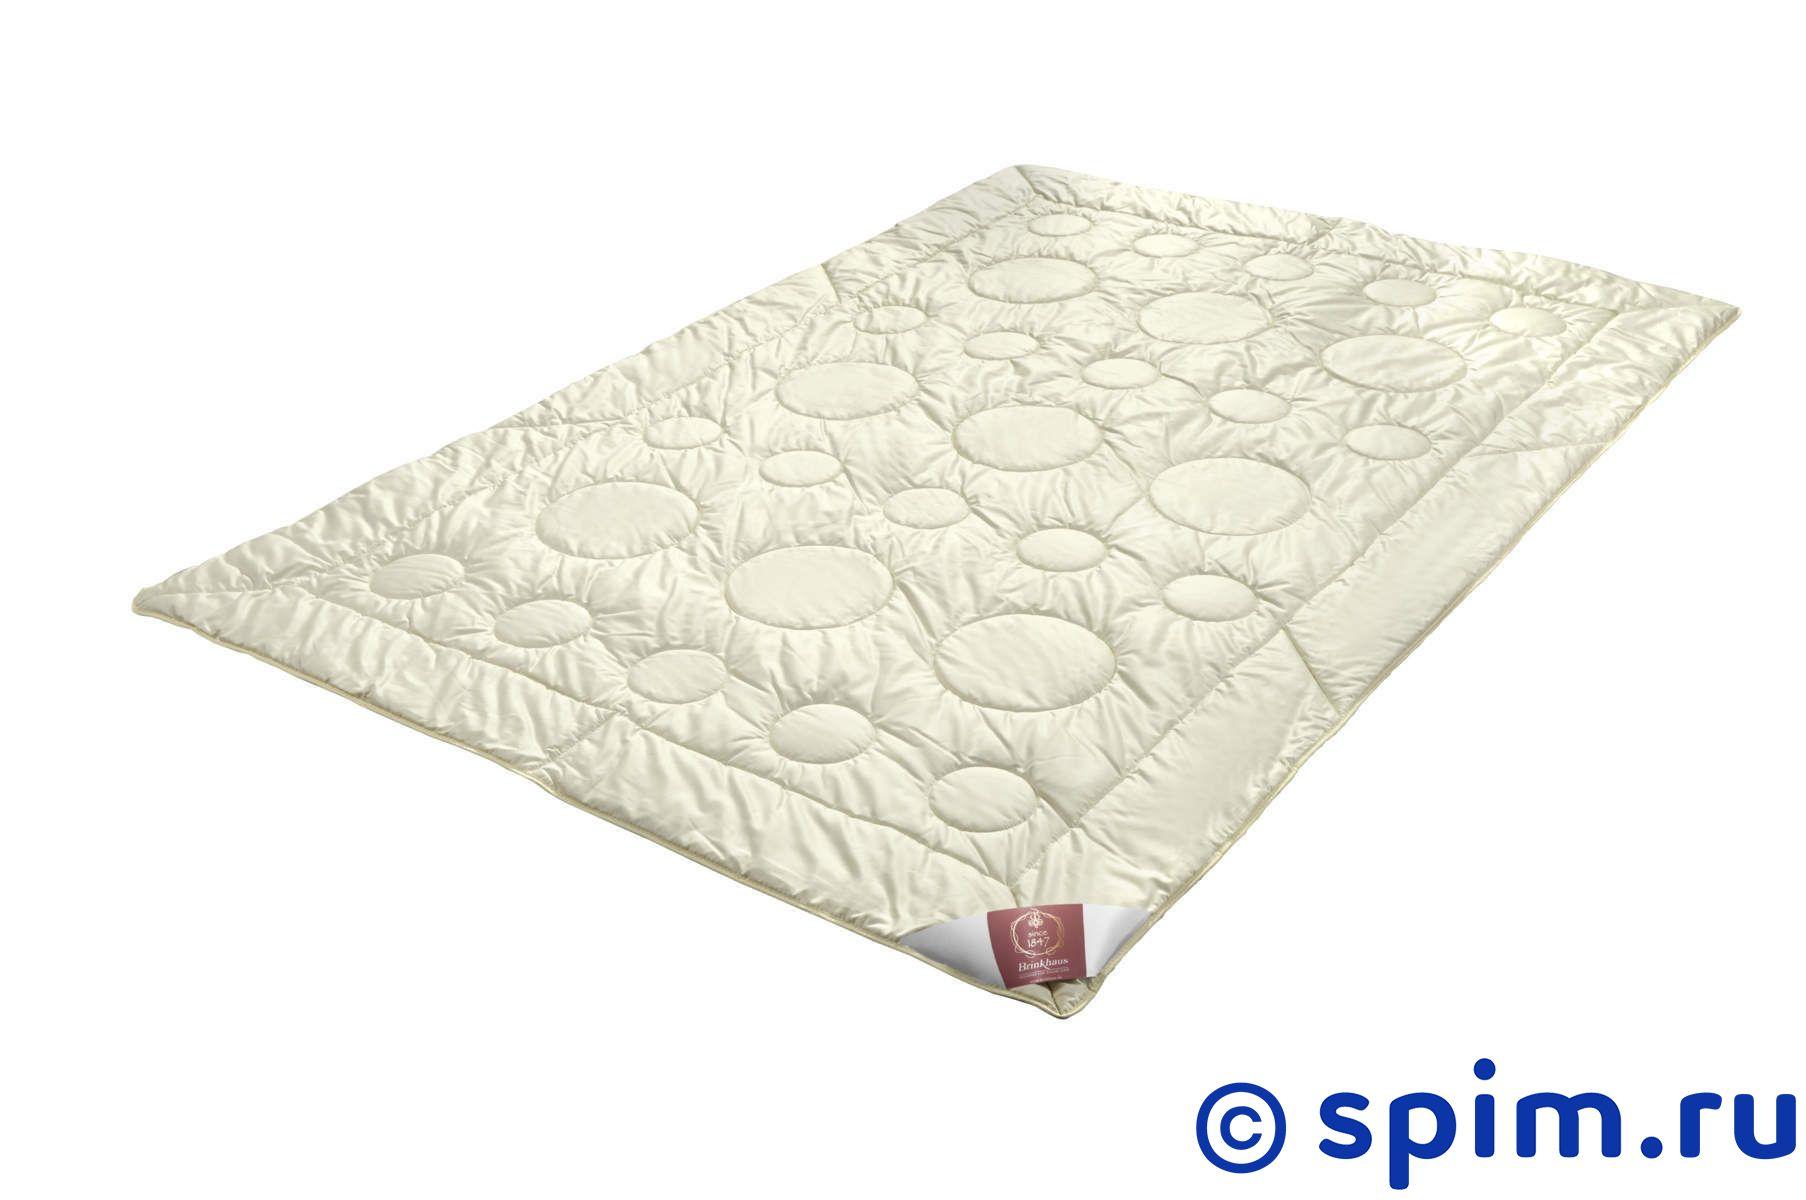 Одеяло Brinkhaus Sida, среднее 155х200 см